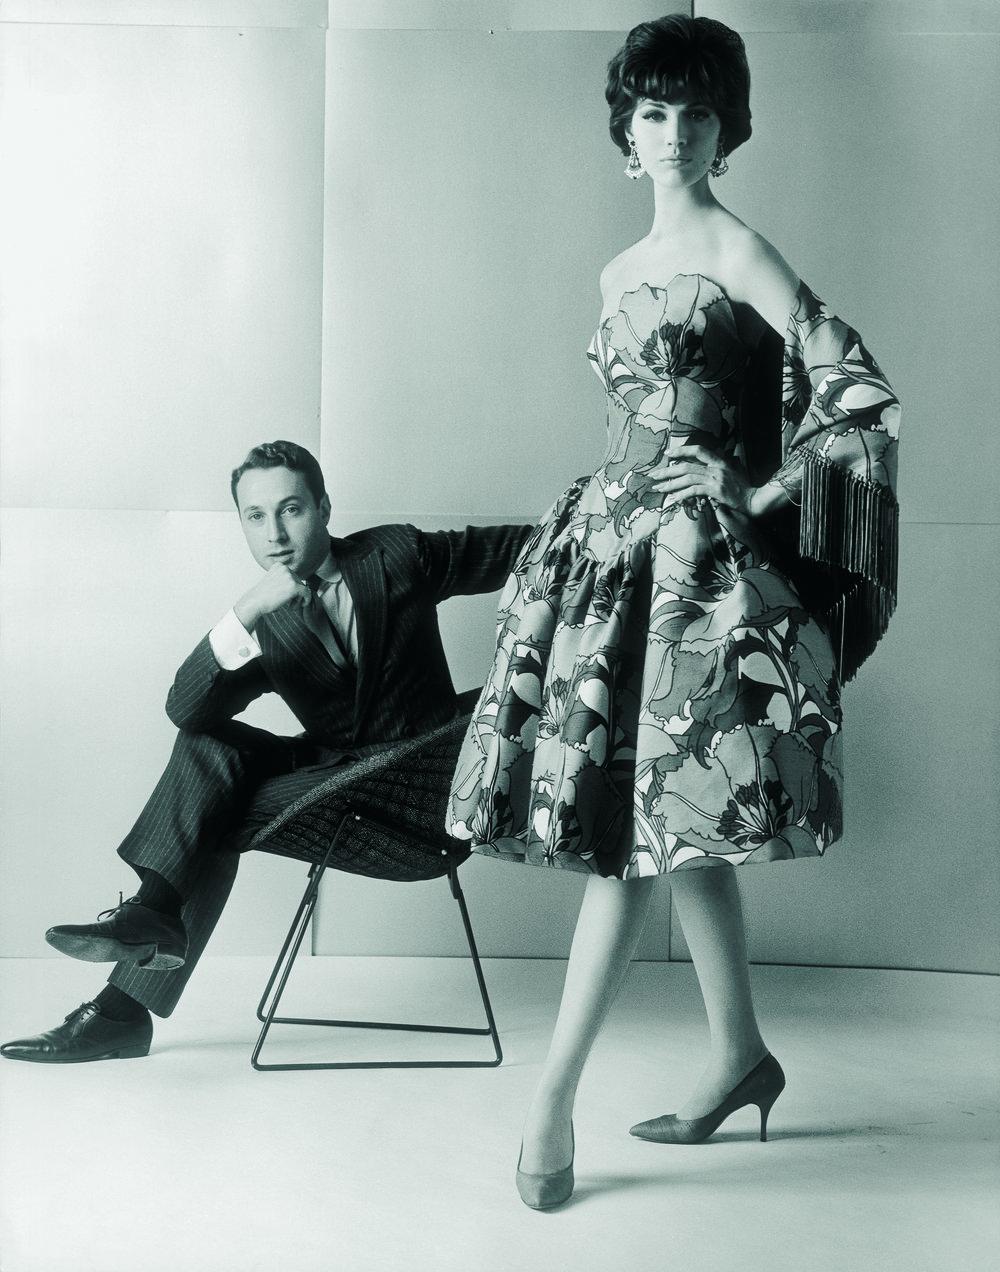 Fash_Bath_ScaasiCocktail1961cErnestineCarterArchive_Fashion-MuseumBathandNorthEastSomersetCouncil.jpg